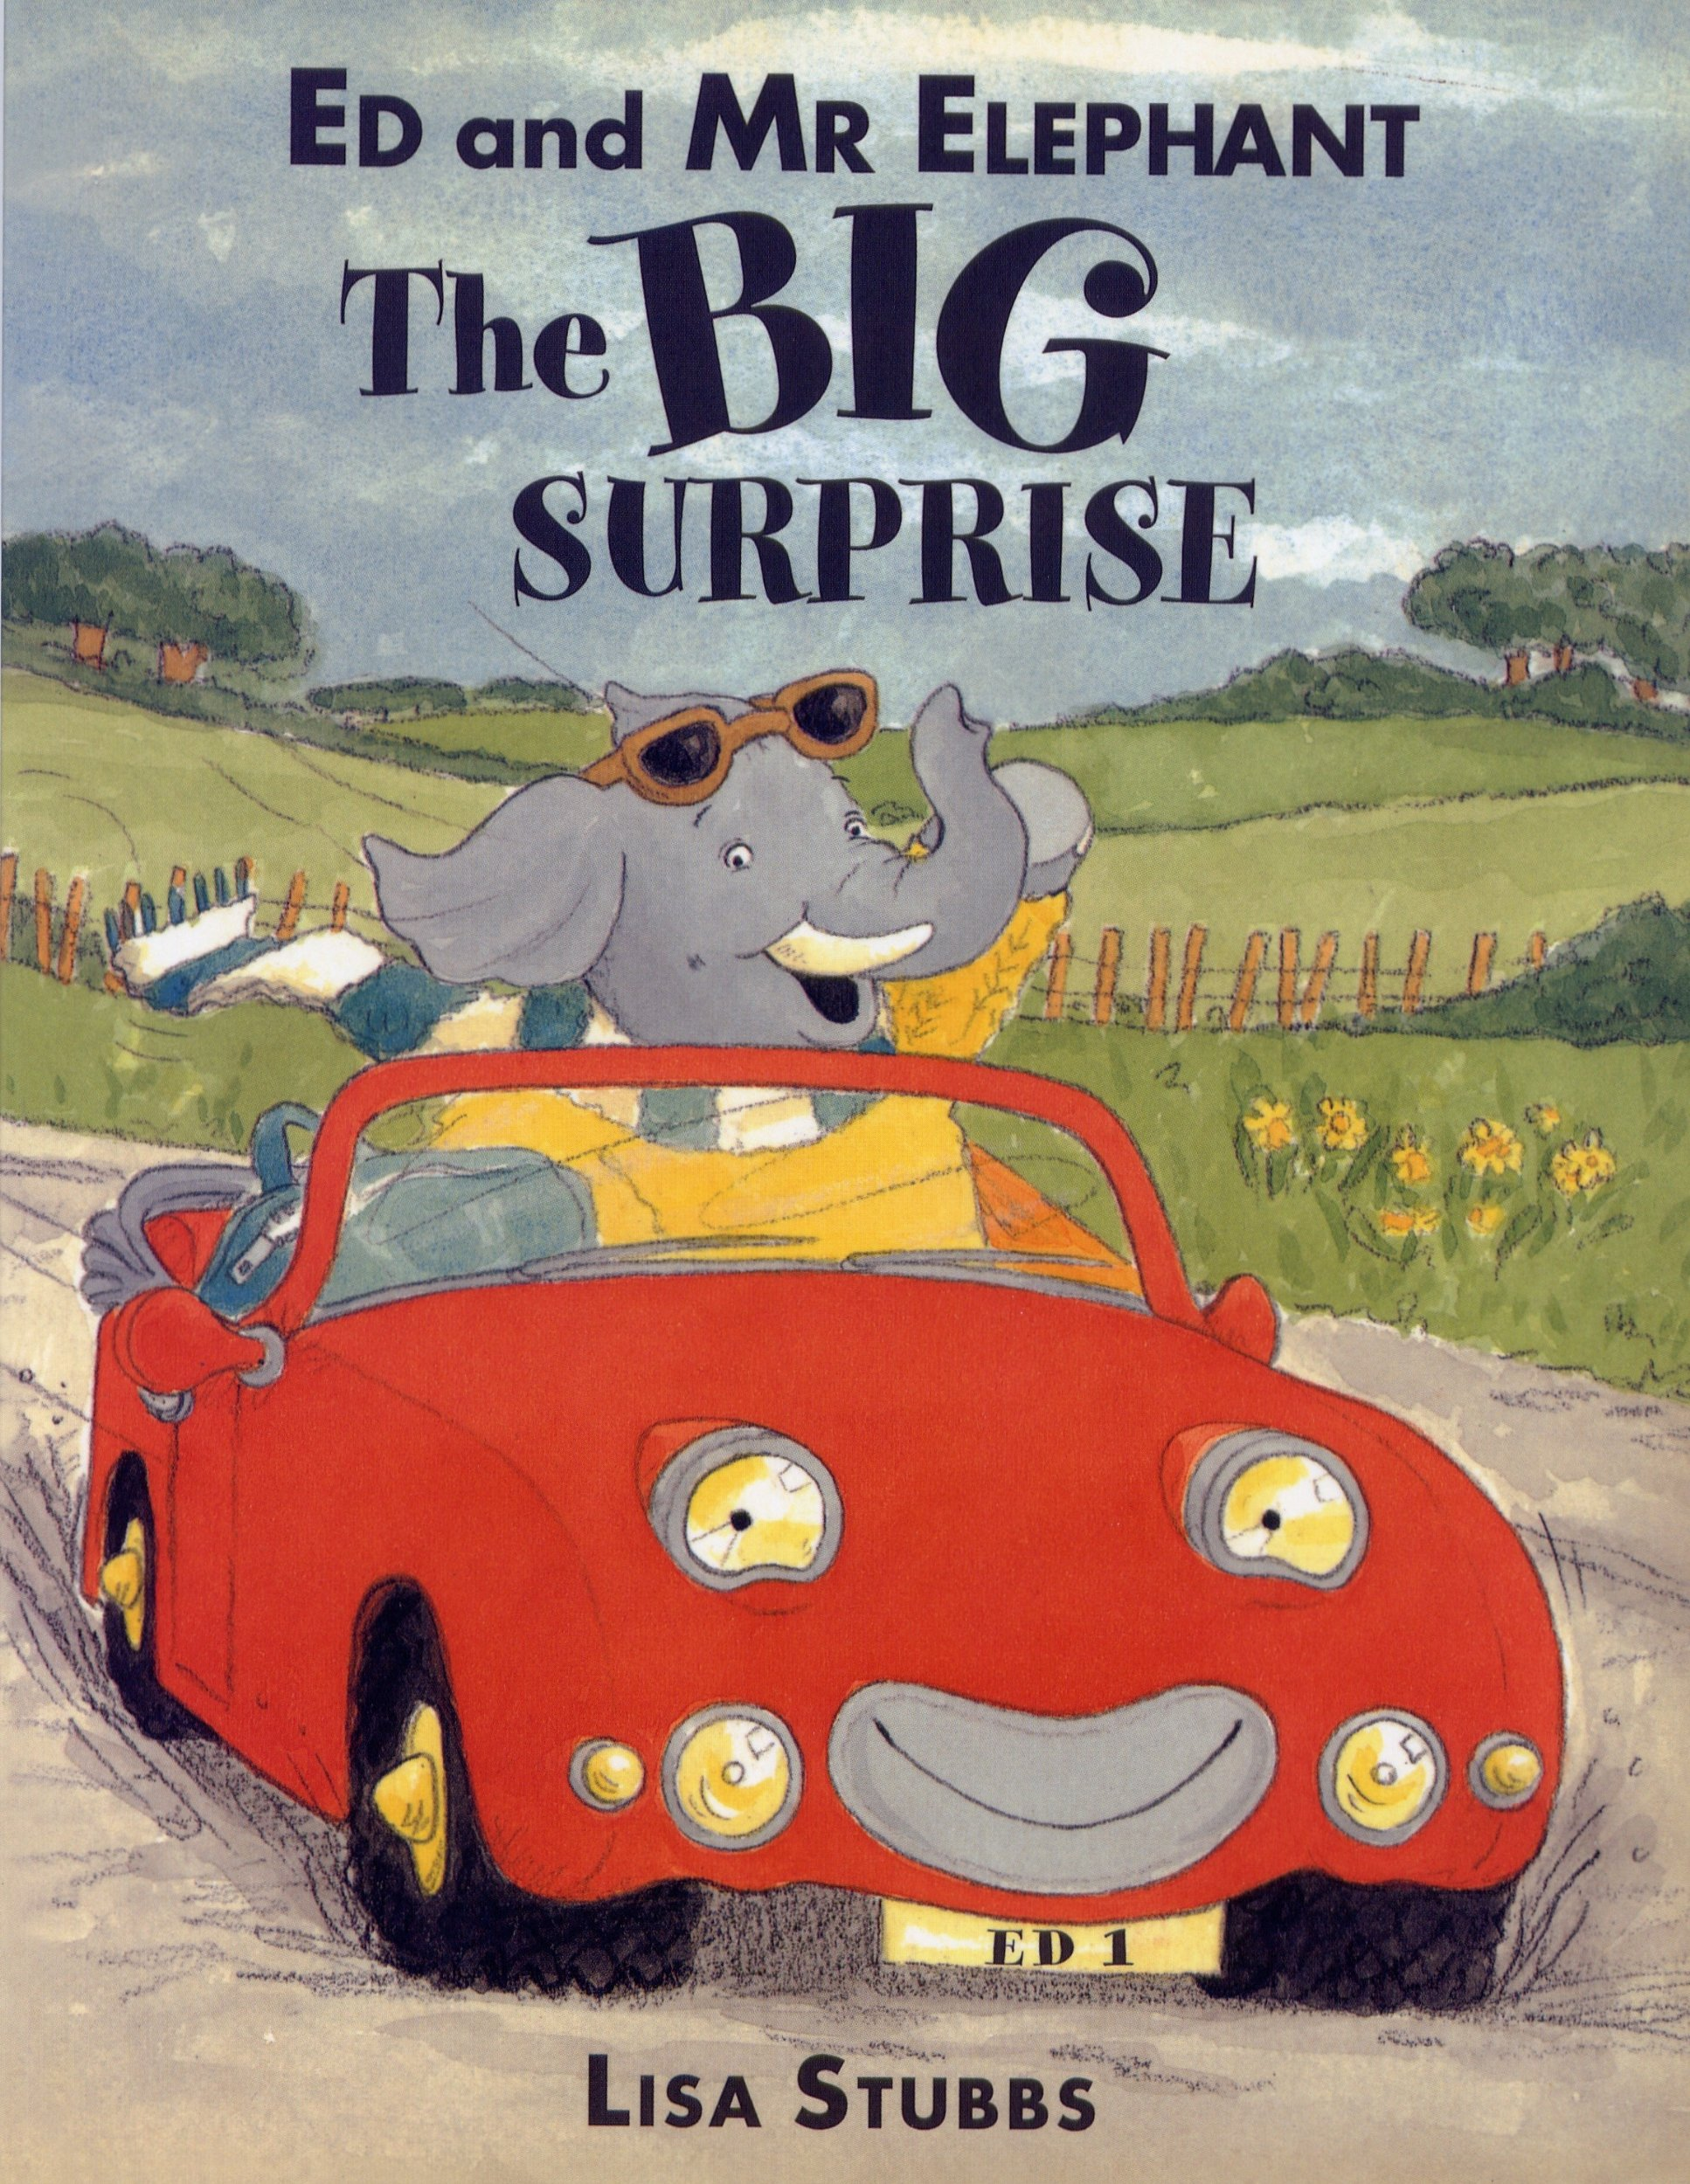 Ed & Mr Elephant, The Big Surprise by Lisa Stubbs: Amazon.co.uk: Lisa  Stubbs: 9781905606955: Books